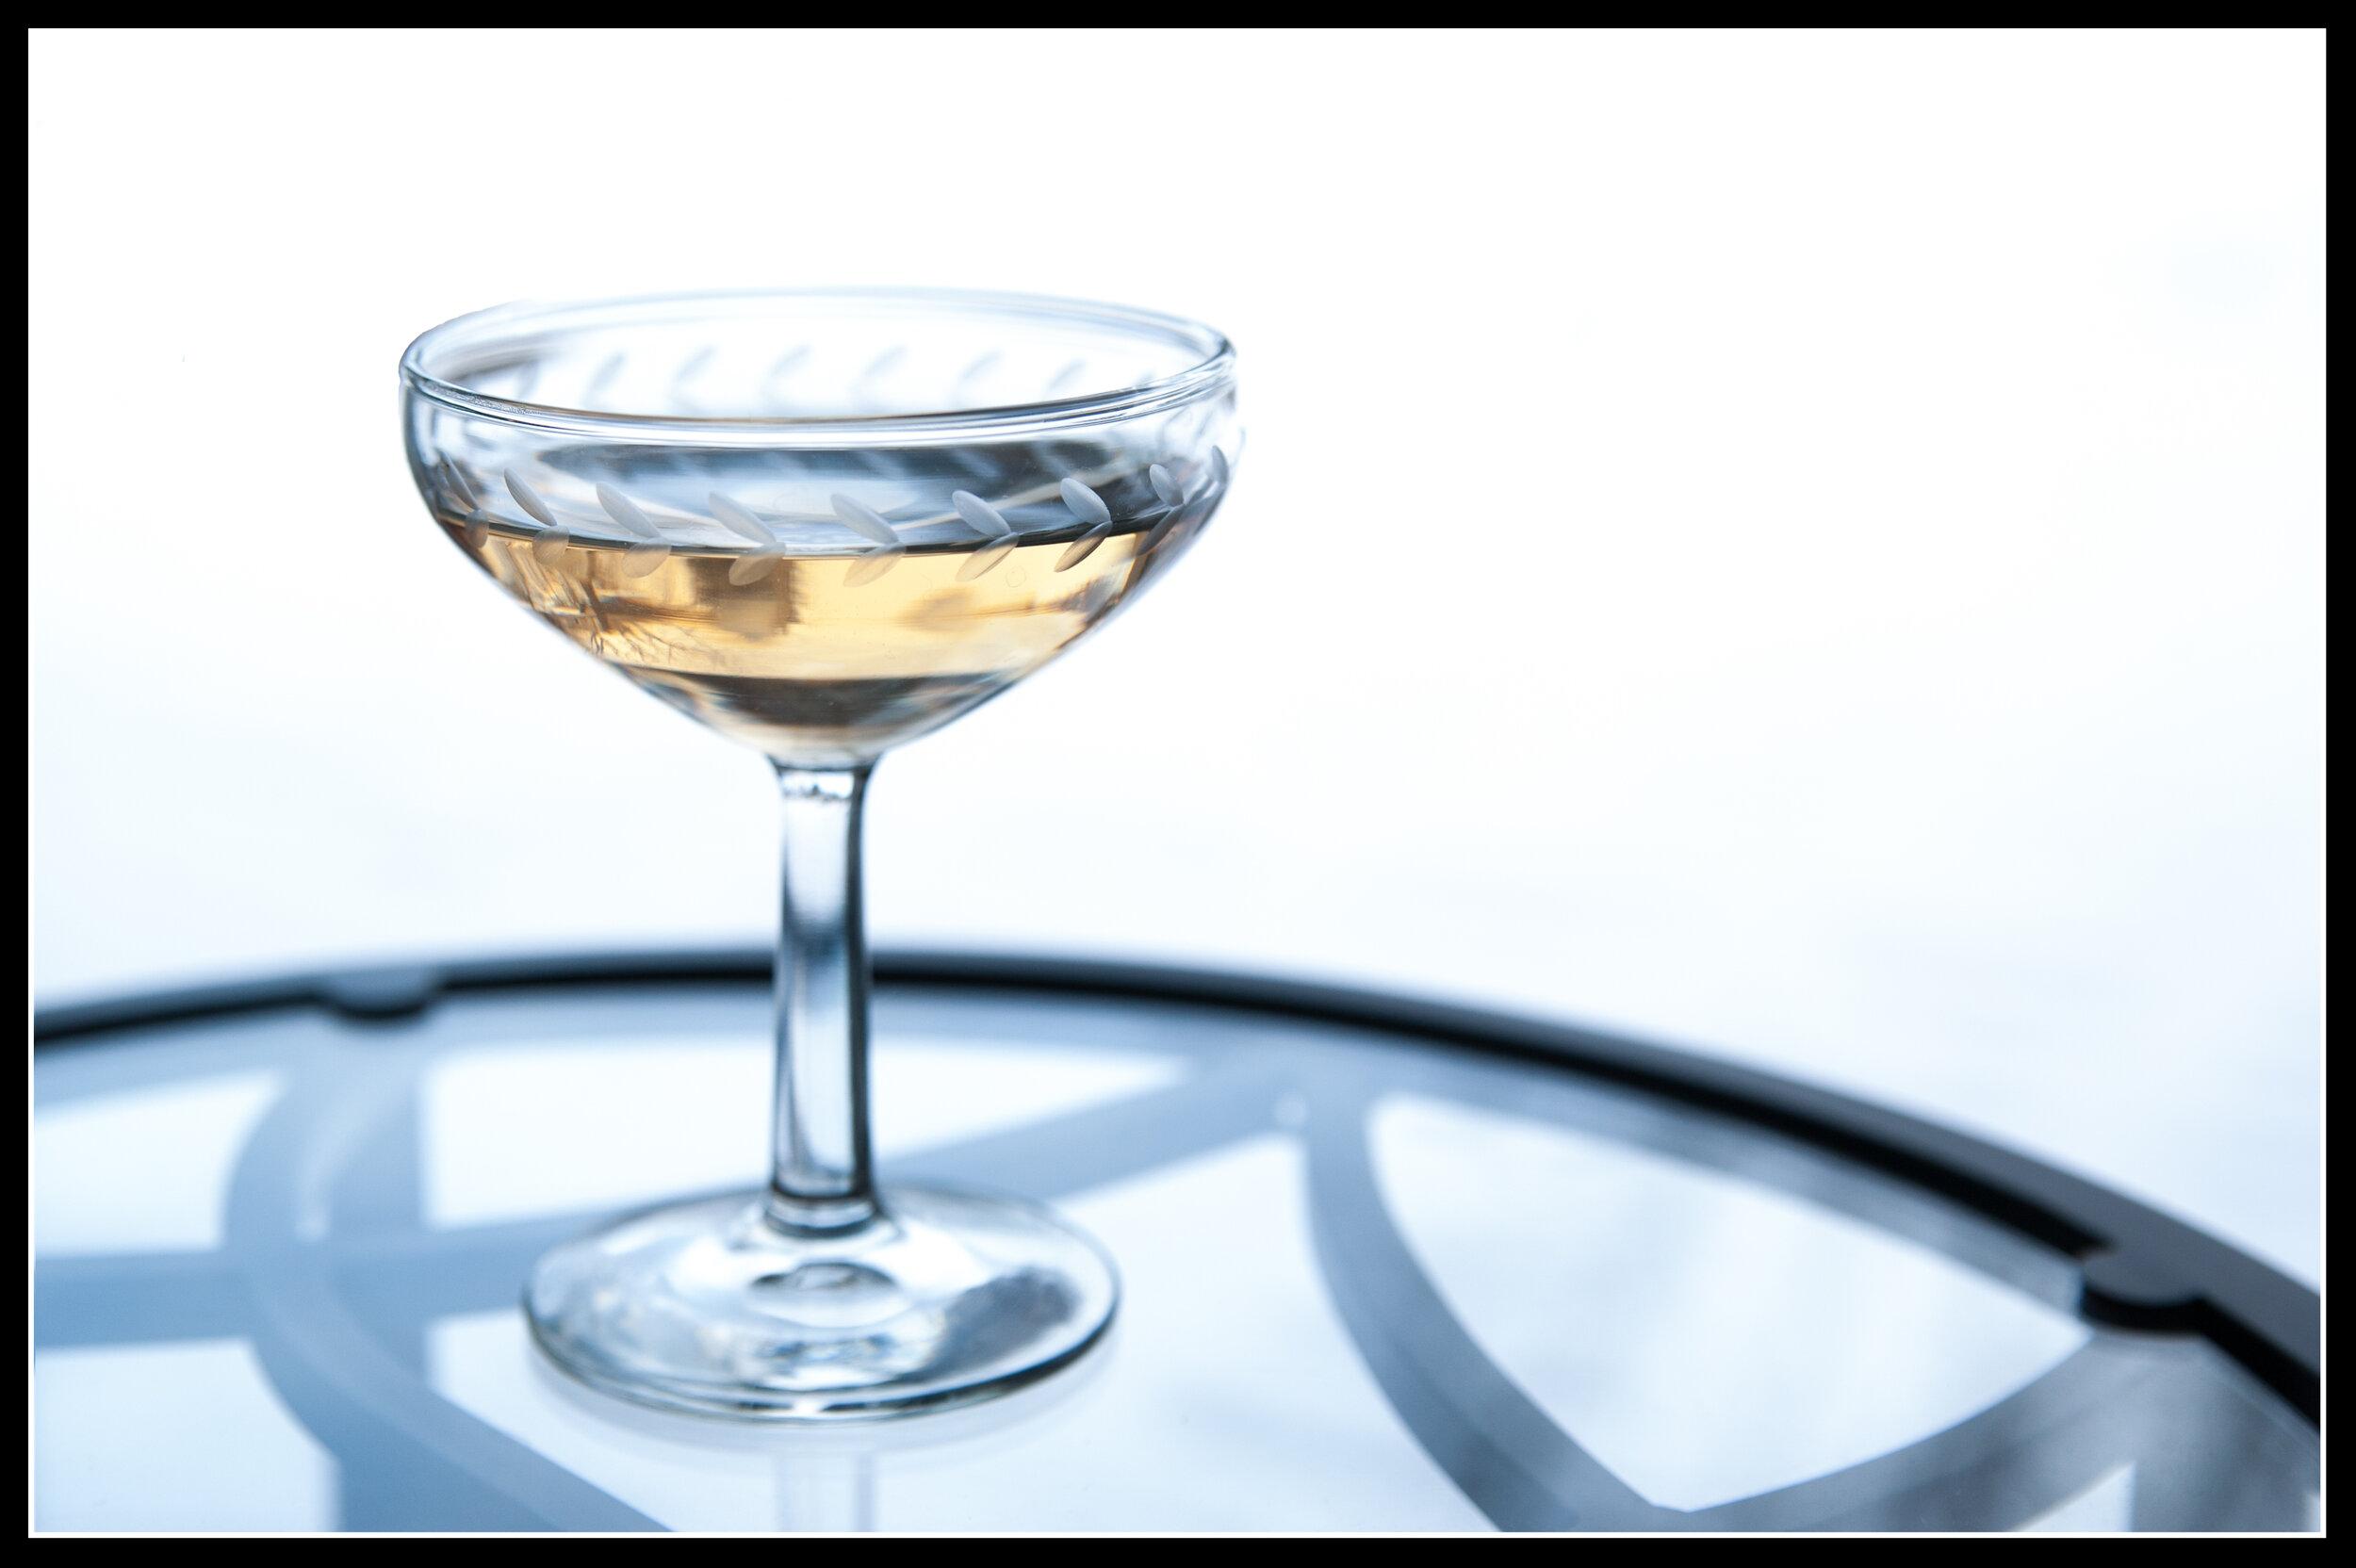 El Presidente - 1.5 oz Whitecap Rum1.5 oz Lillet Blanc1 tsp of Cointreau.5 tsp of GrenadineServe in chilled coupe glass